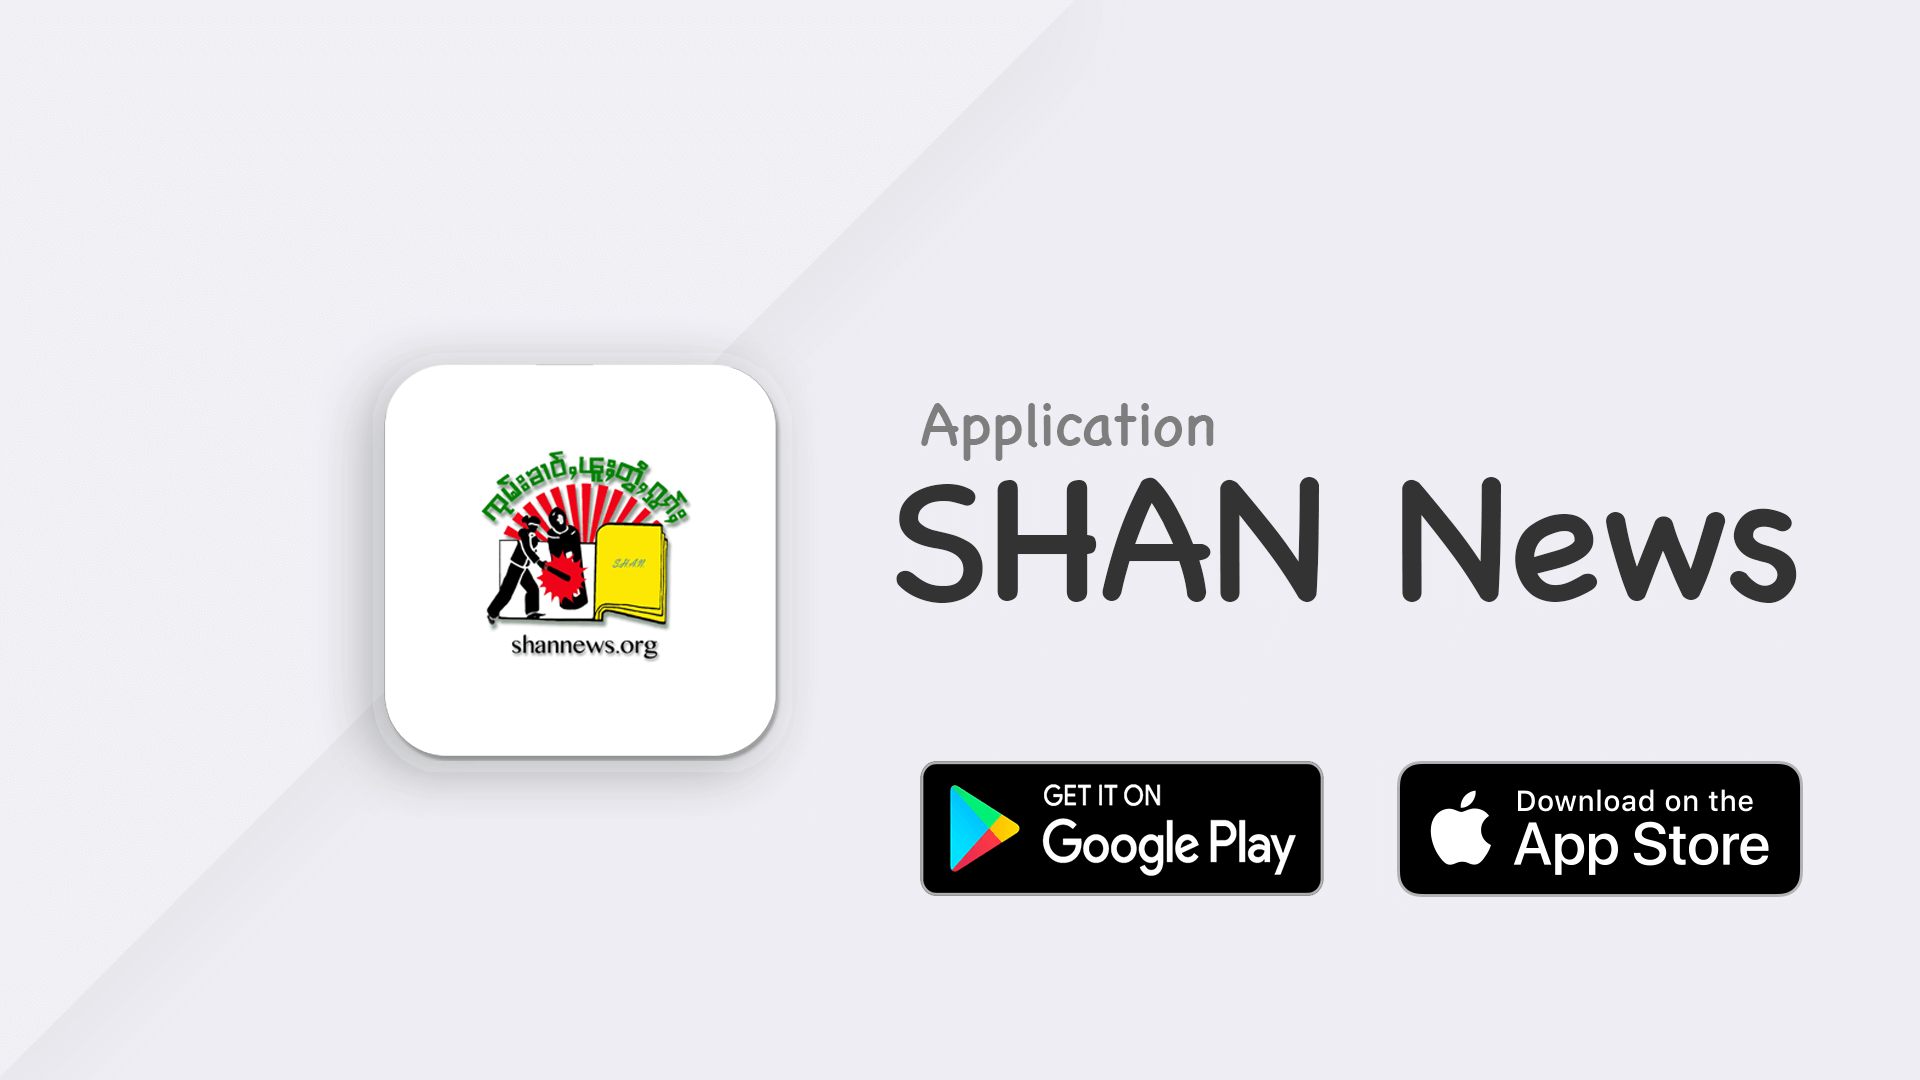 ShannewsApp